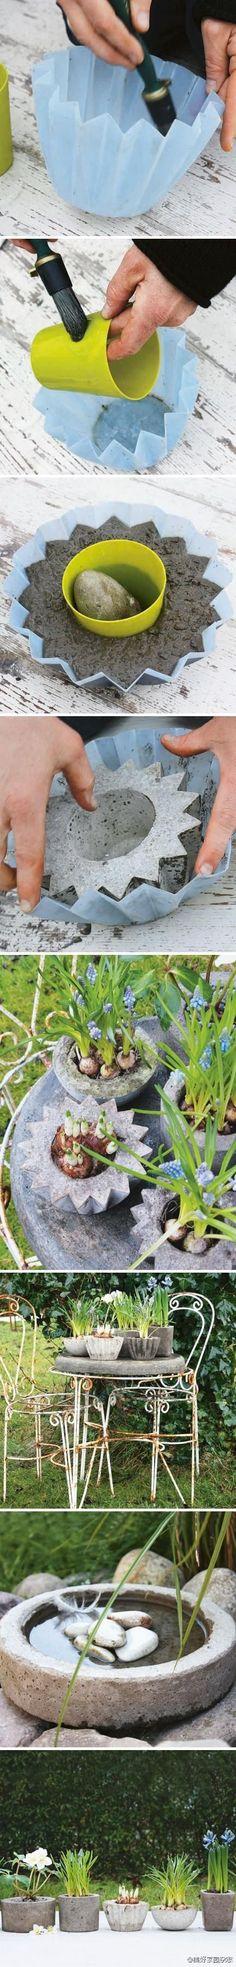 DIY Concrete Casting DIY Projects / UsefulDIY.com